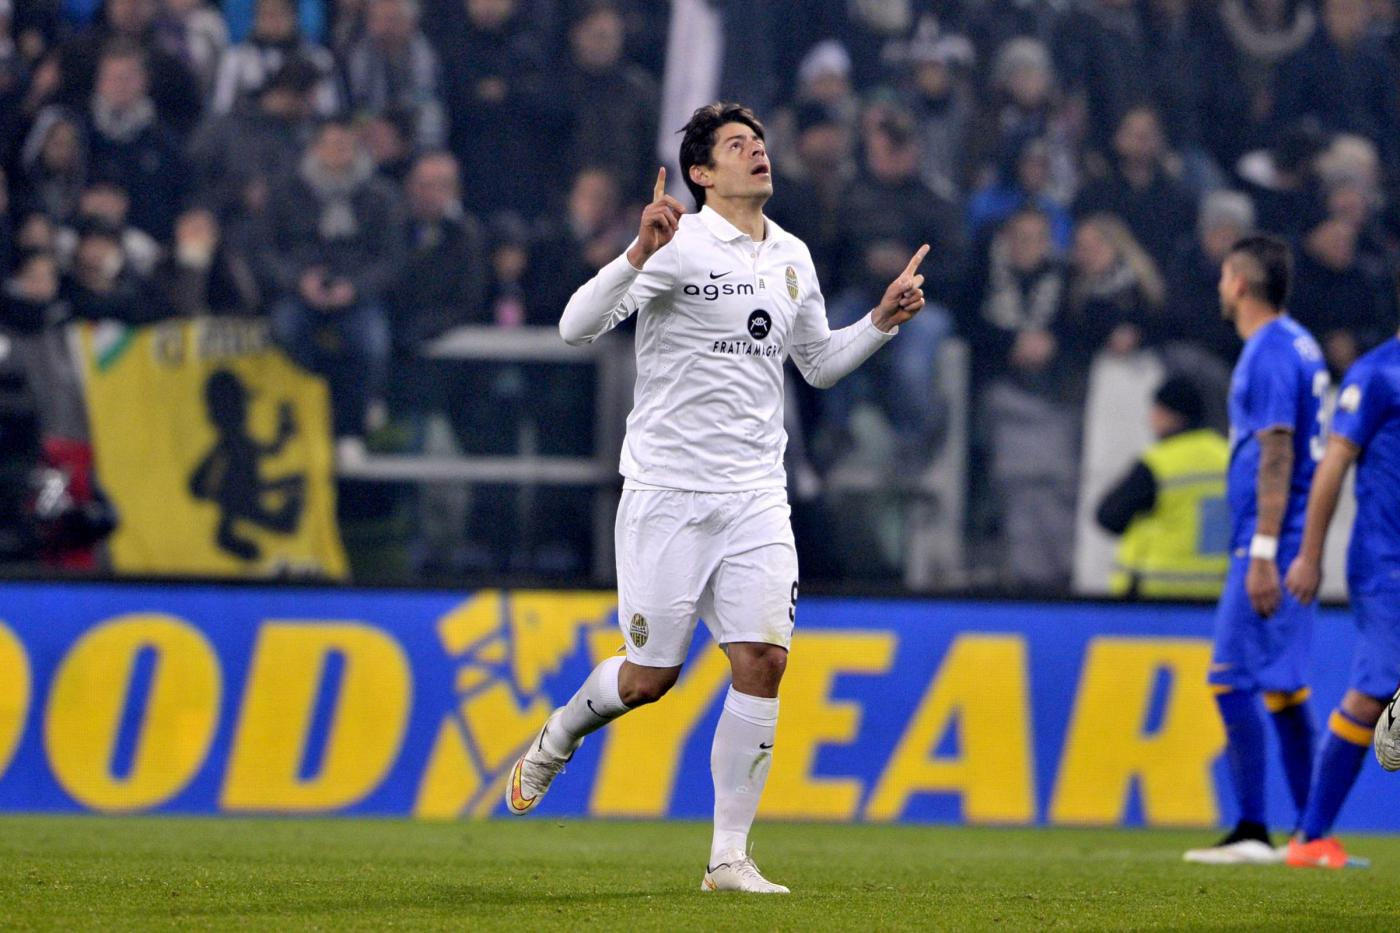 Coppa Italia - Juventus vs. Hellas Verona